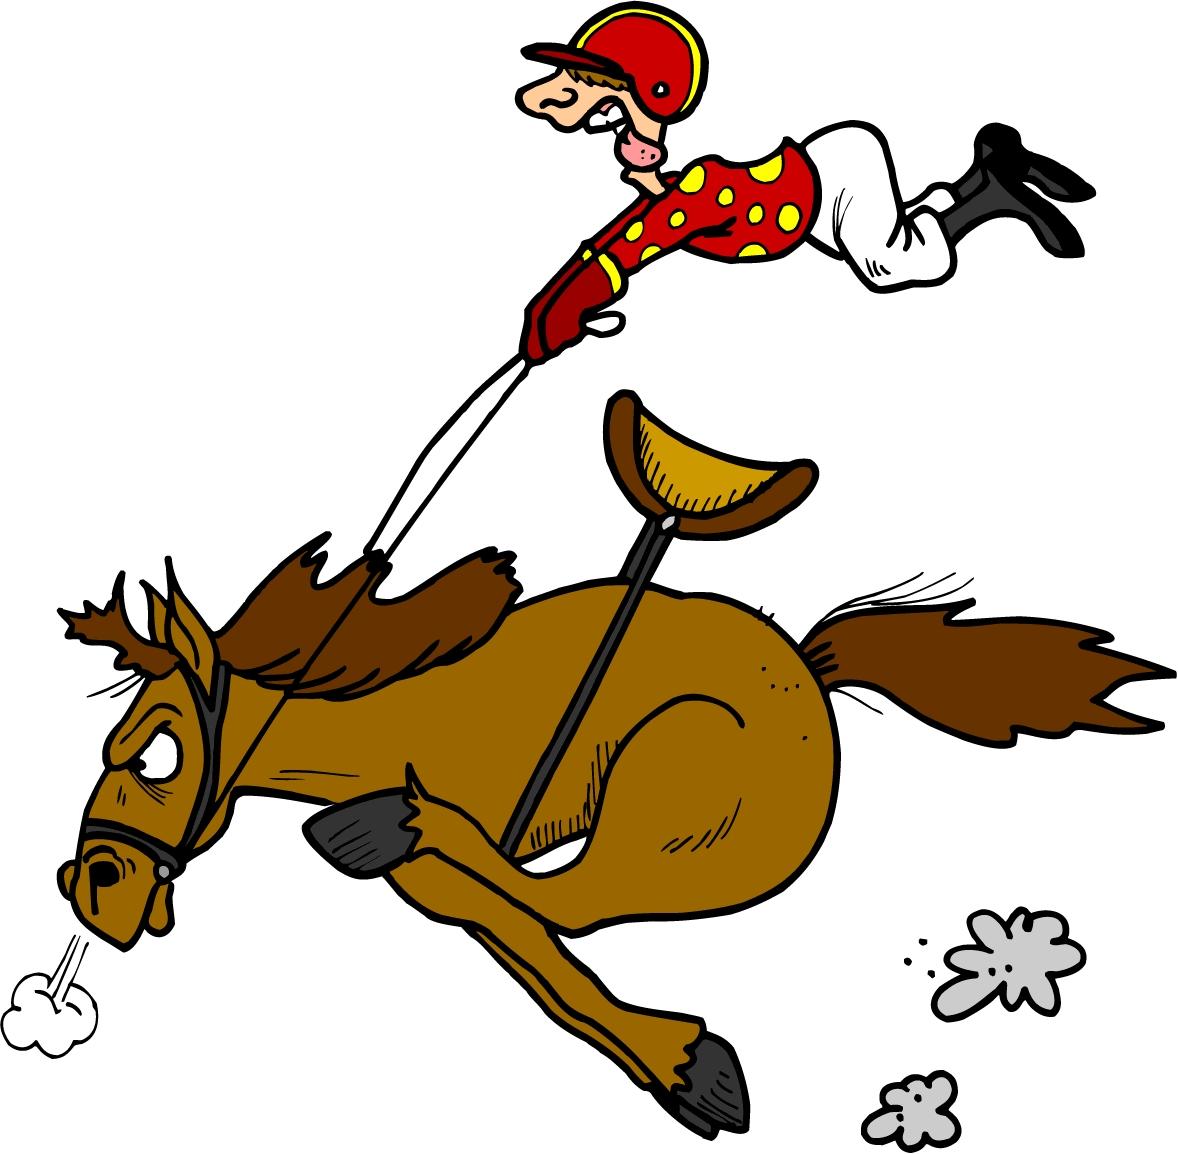 1178x1154 Horse Racing Clip Art Many Interesting Cliparts